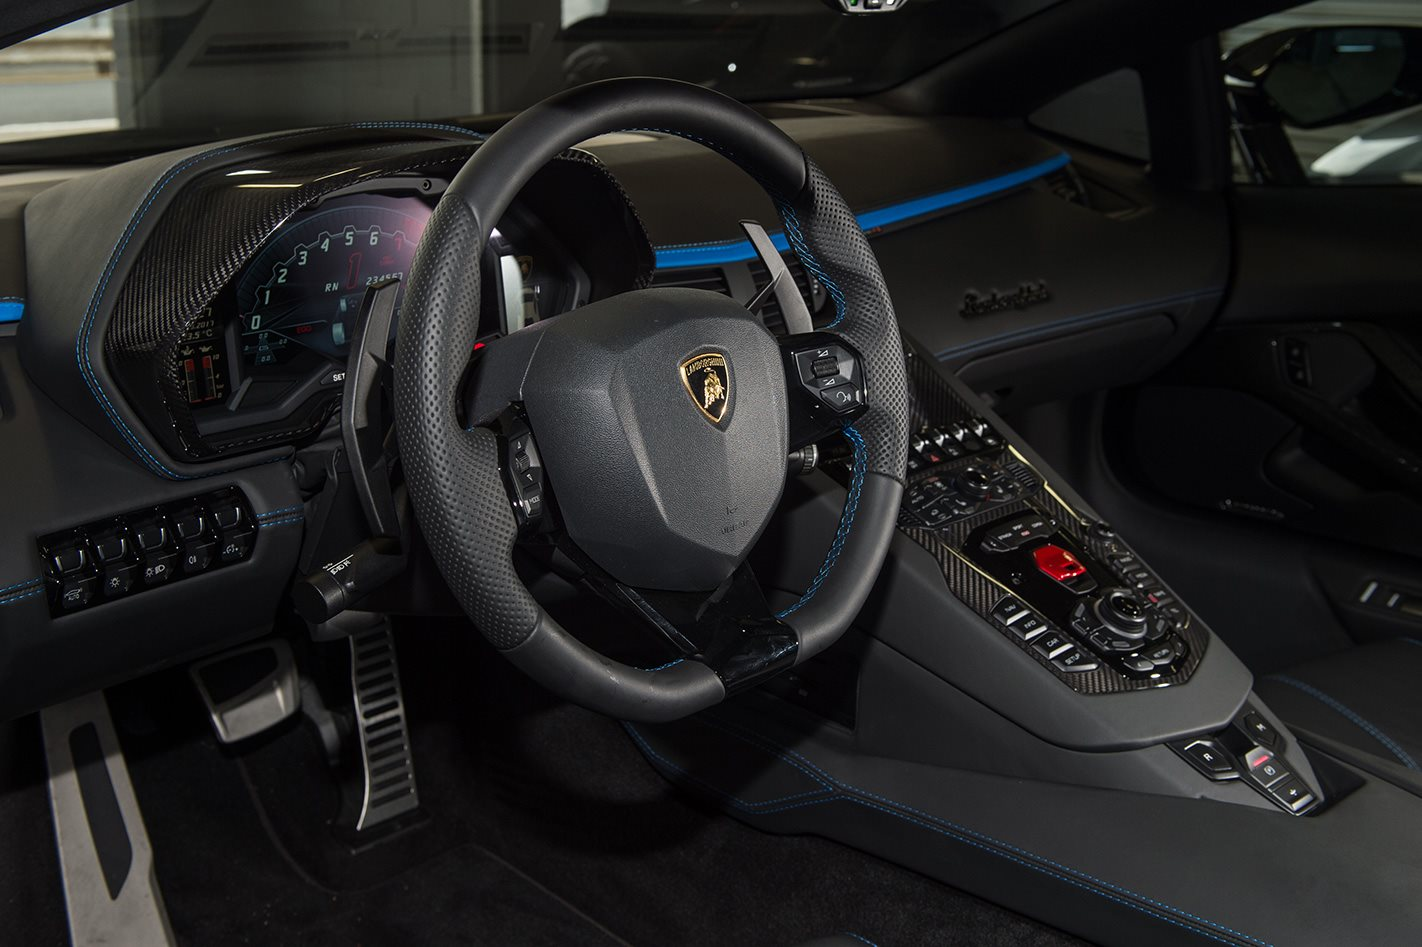 2017 Lamborghini Aventador S Review | MOTOR